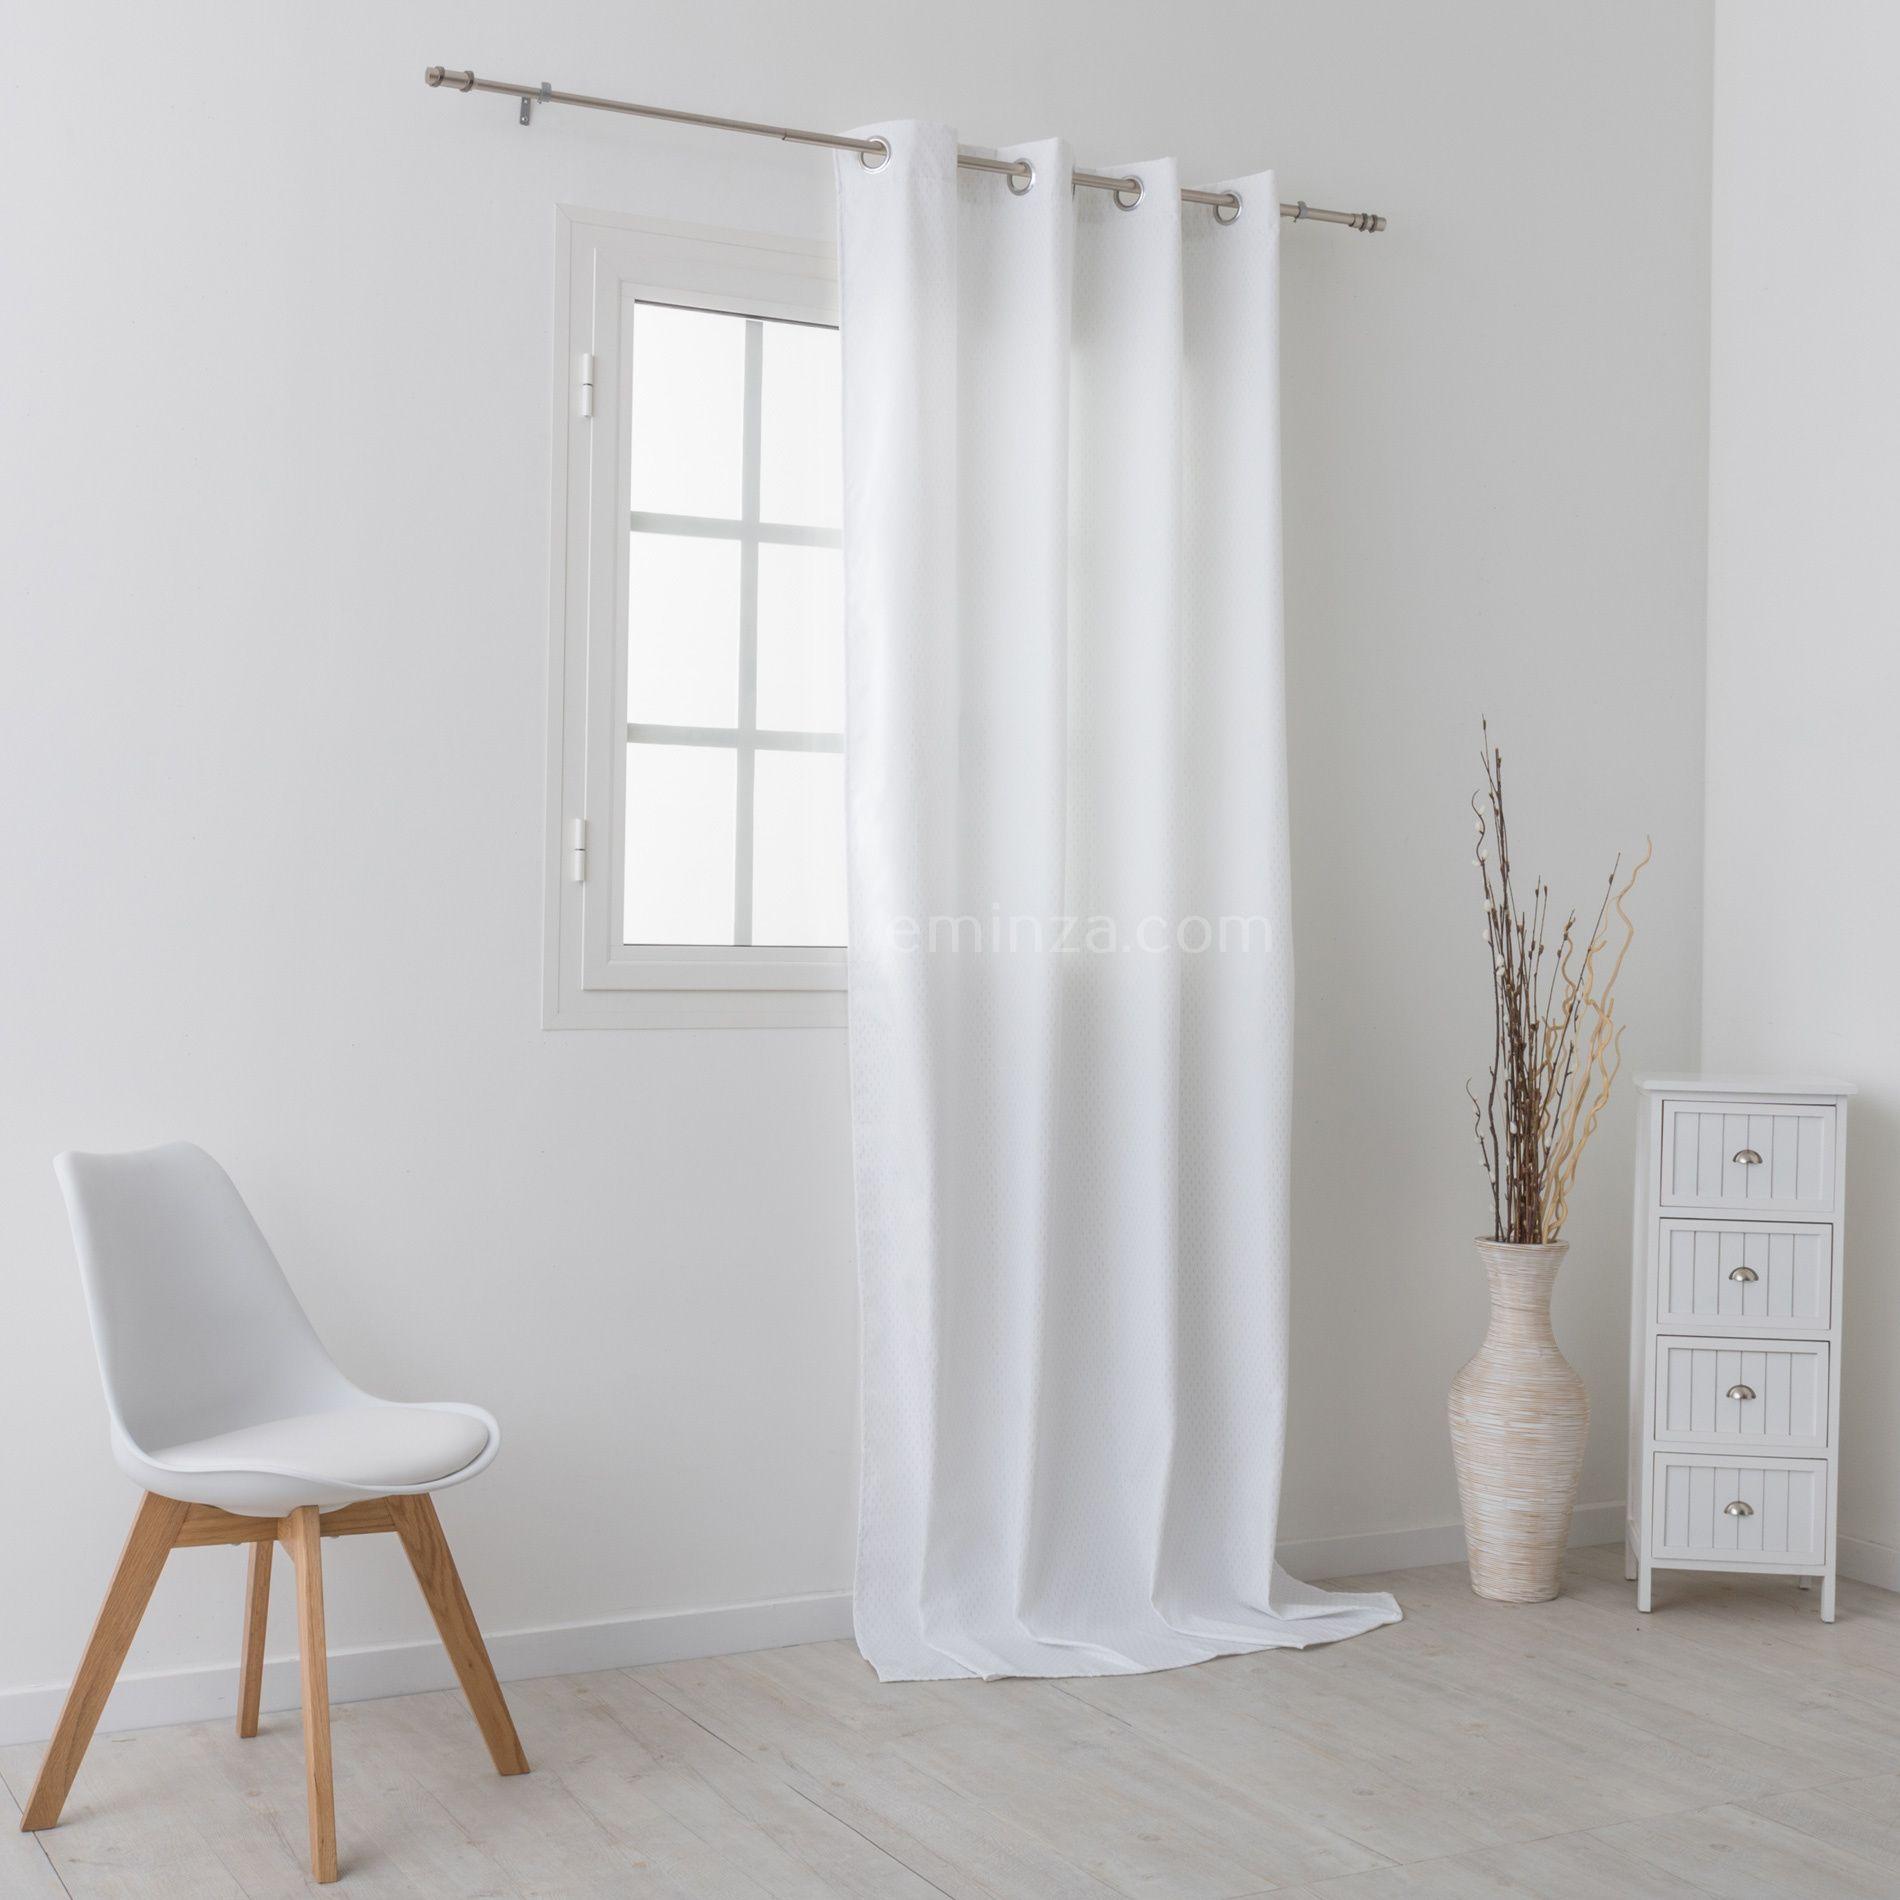 rideau obscurcissant isolant 140 x h260 cm daza blanc rideau isolant eminza. Black Bedroom Furniture Sets. Home Design Ideas